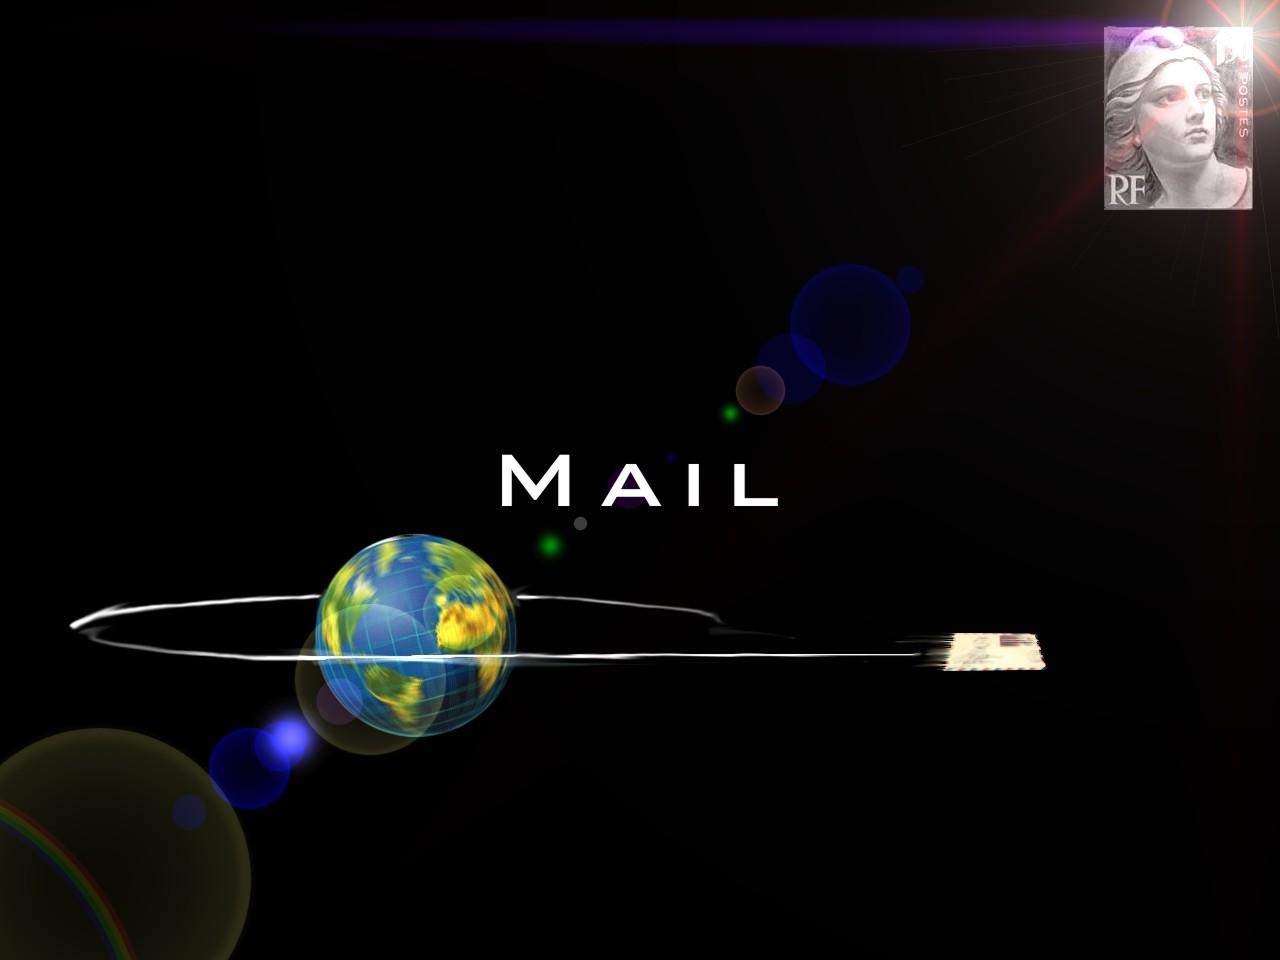 Mail's way